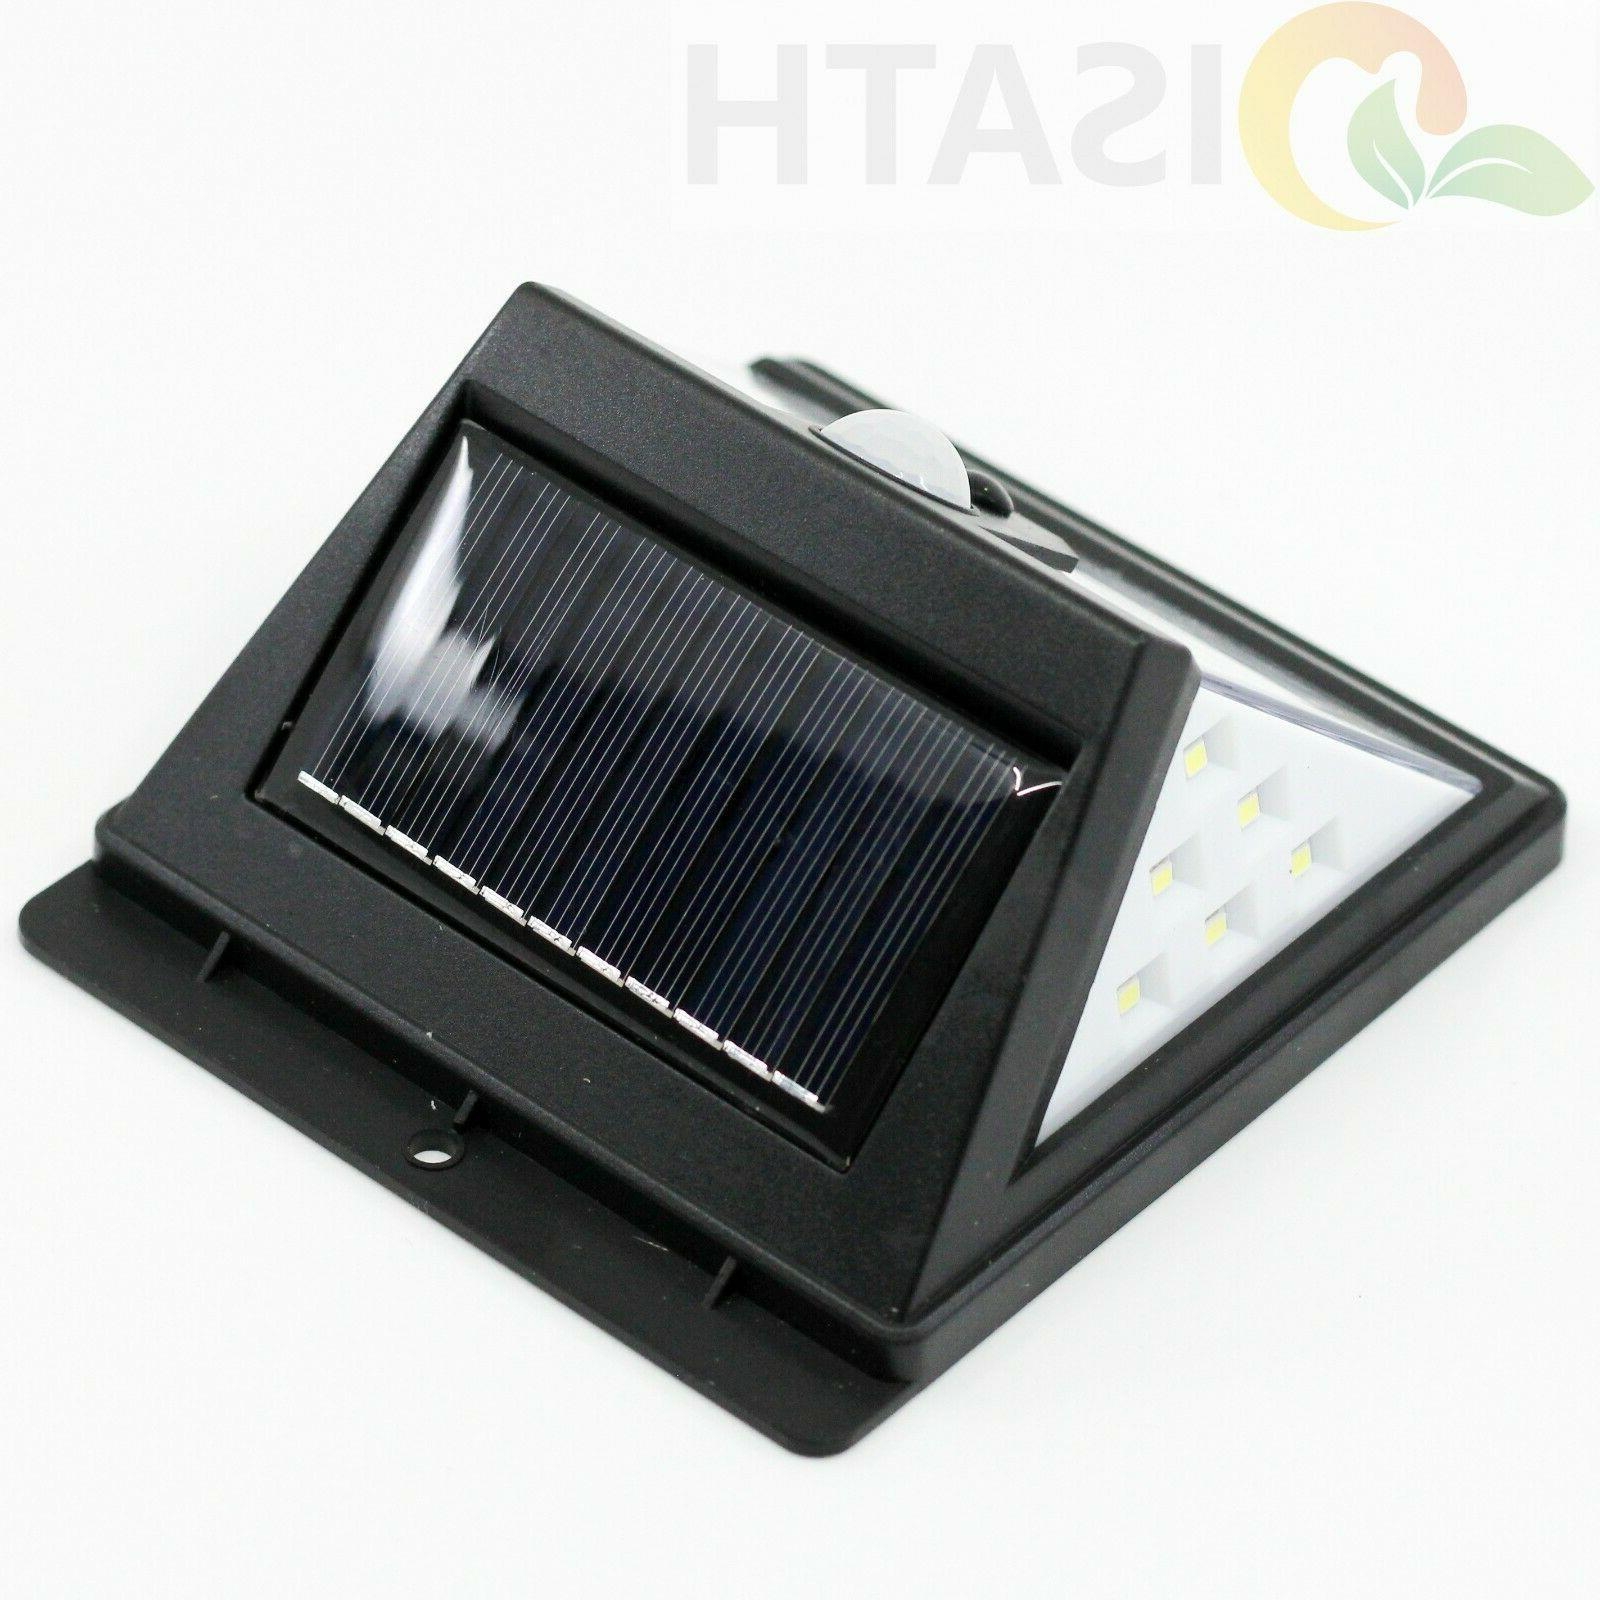 ISATH 40 LED Solar Wall Lights Garden Yard Lamp